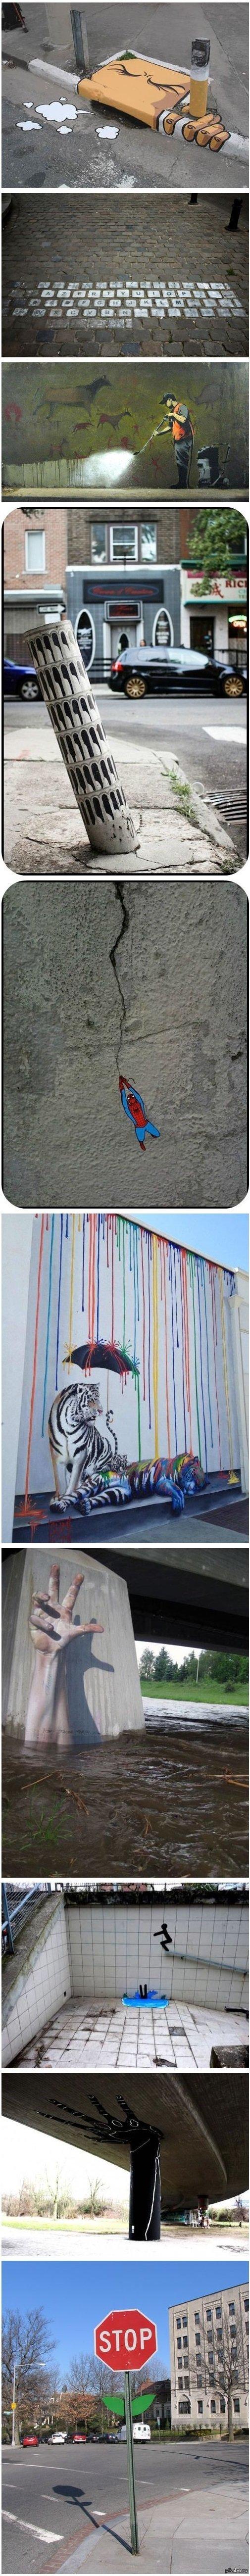 Креатив на улицах города